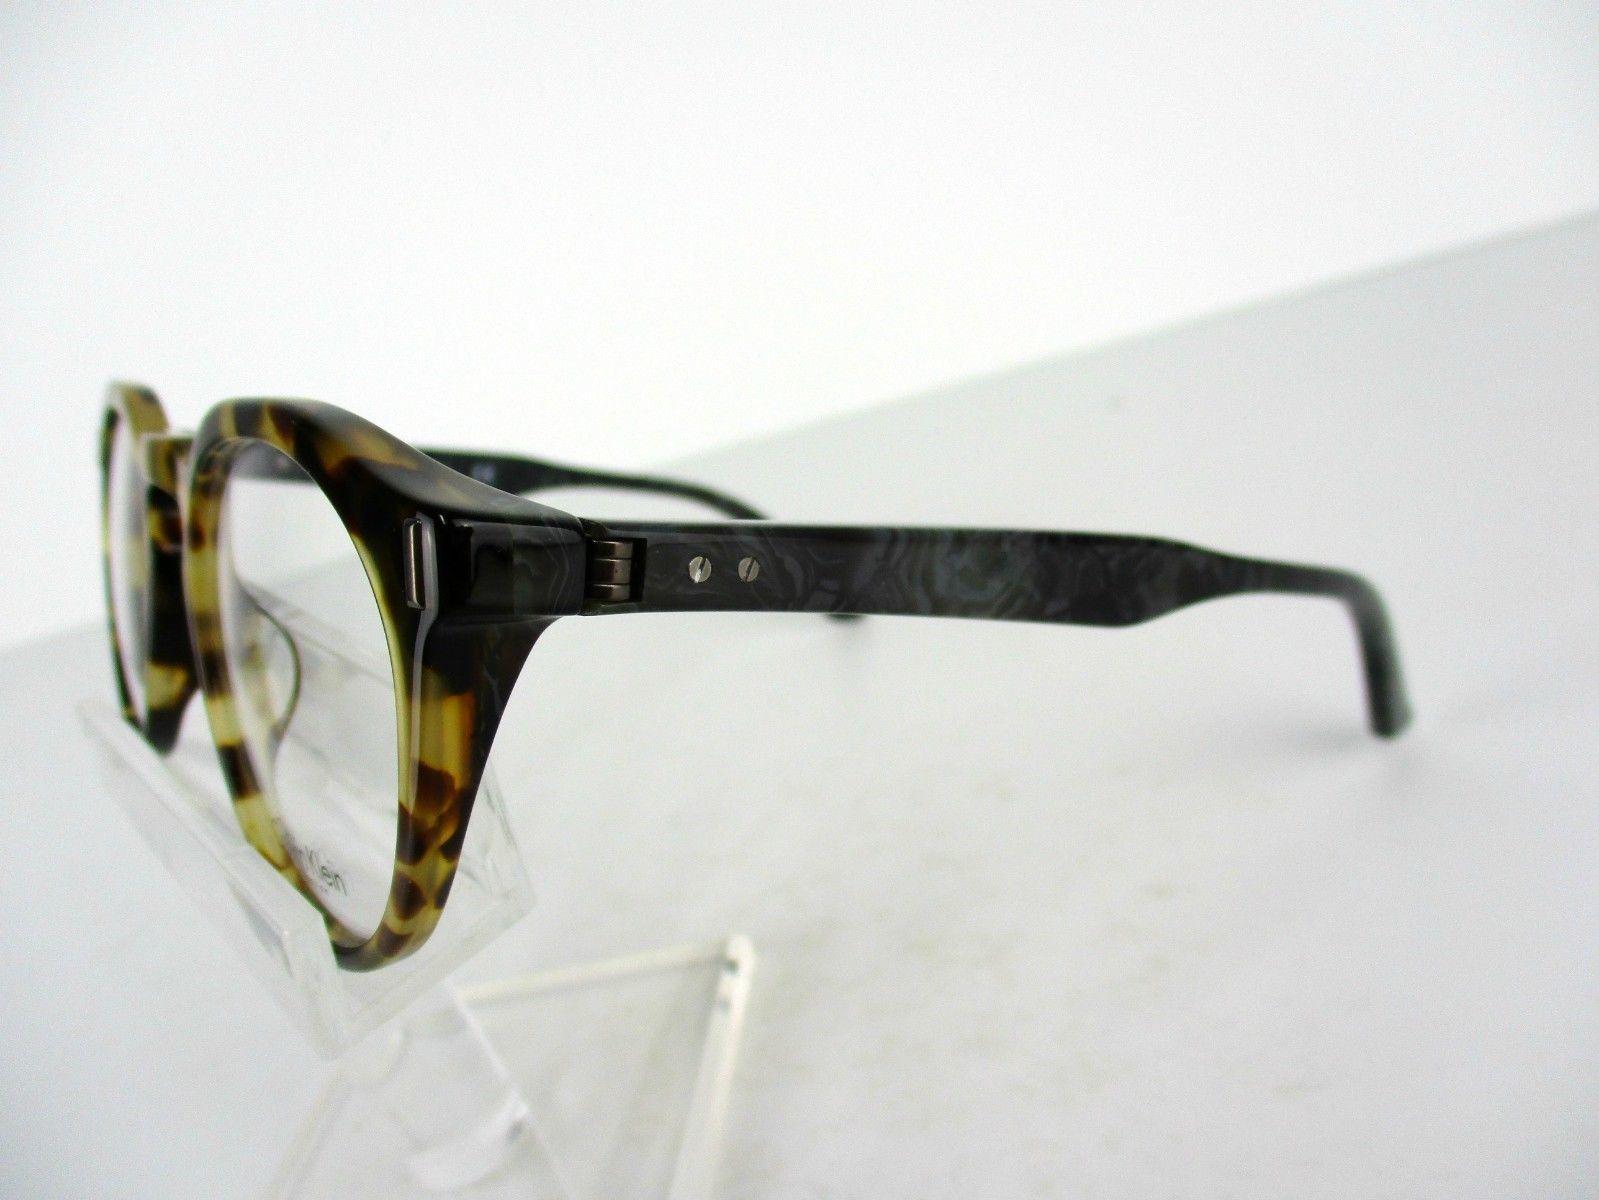 Calvin Klein Ck 8561 (281) Tokyo Tortoise 49 X 22 140 mm  Eyeglass Frame